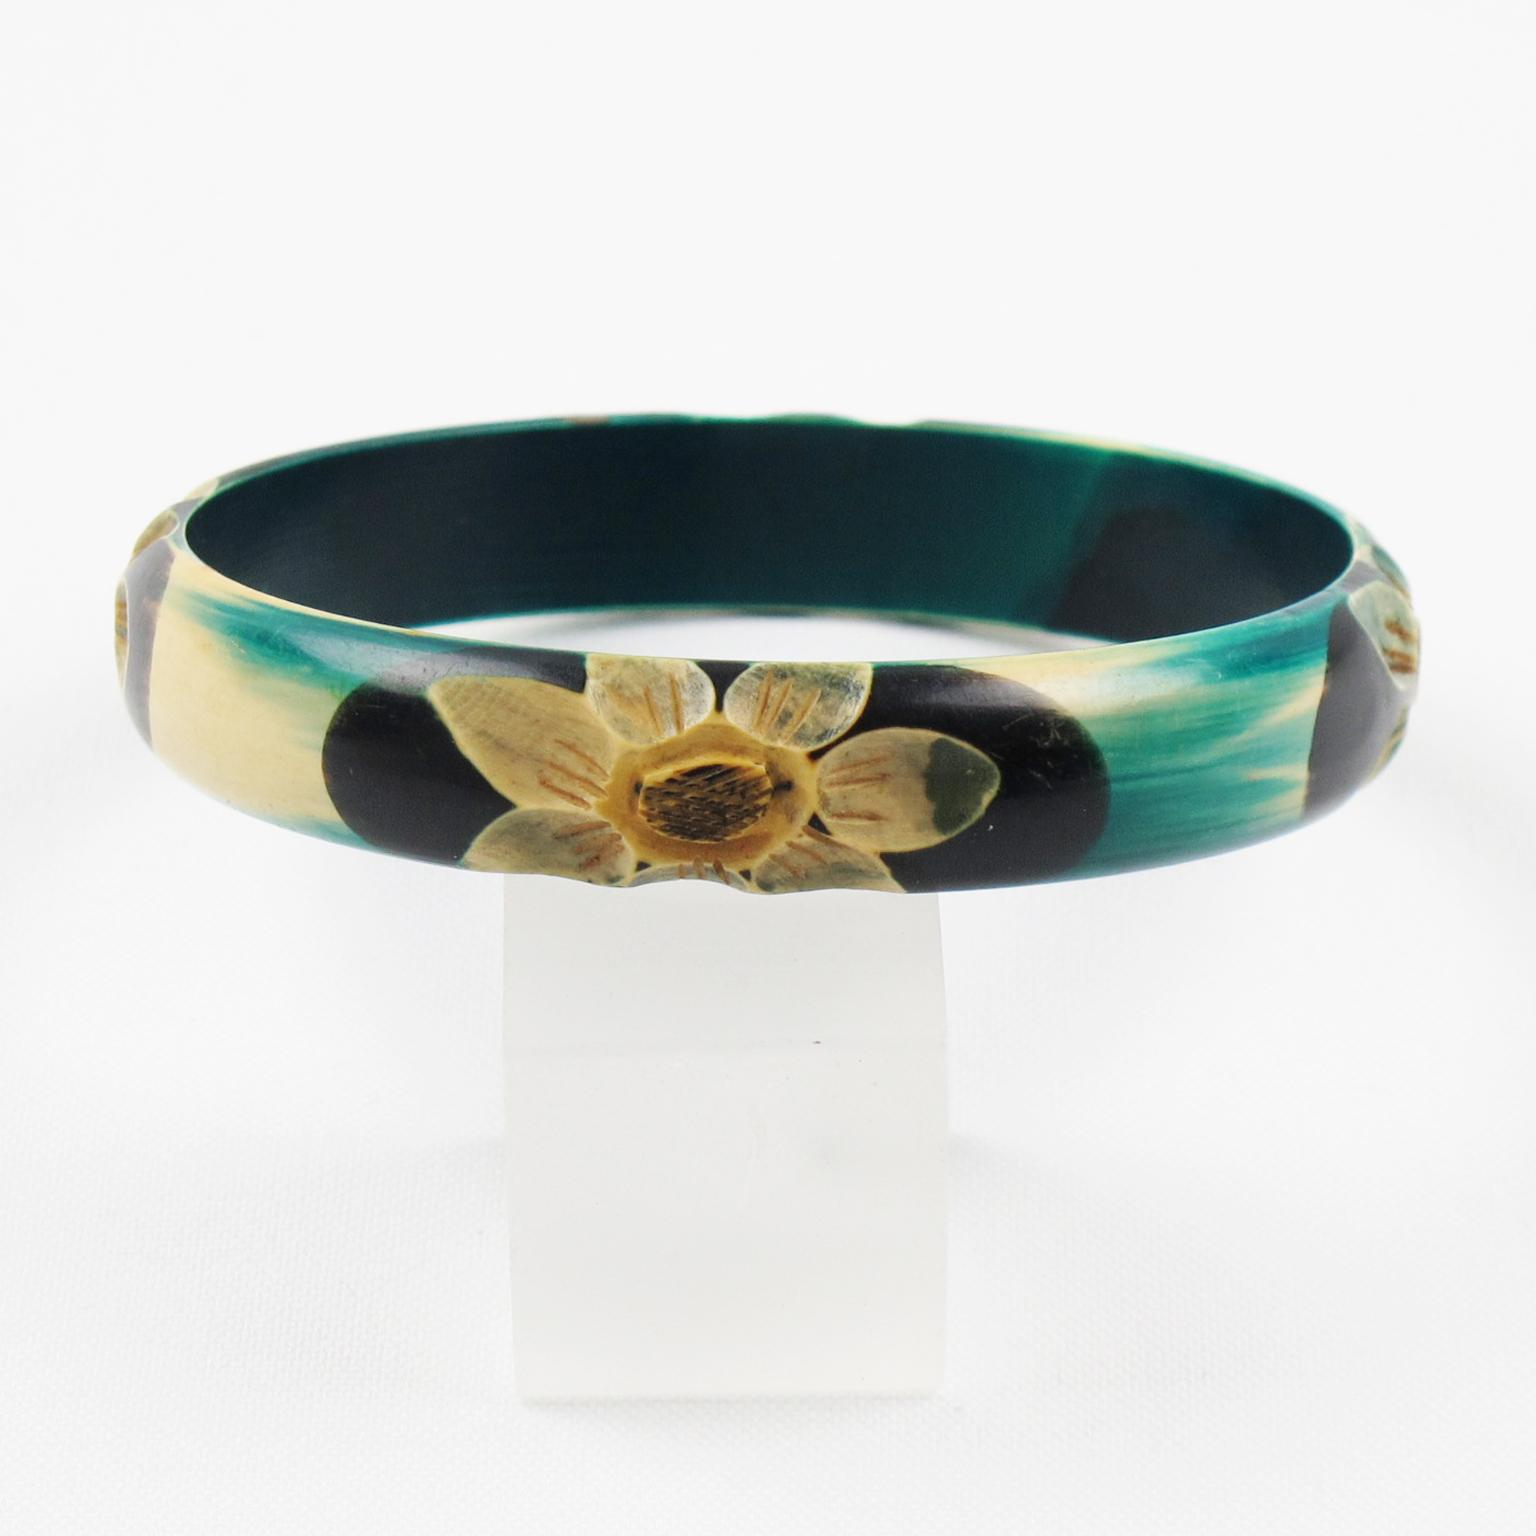 Vintage french art deco celluloid bracelet bangle floral carved teal from iri - Boutique deco vintage ...